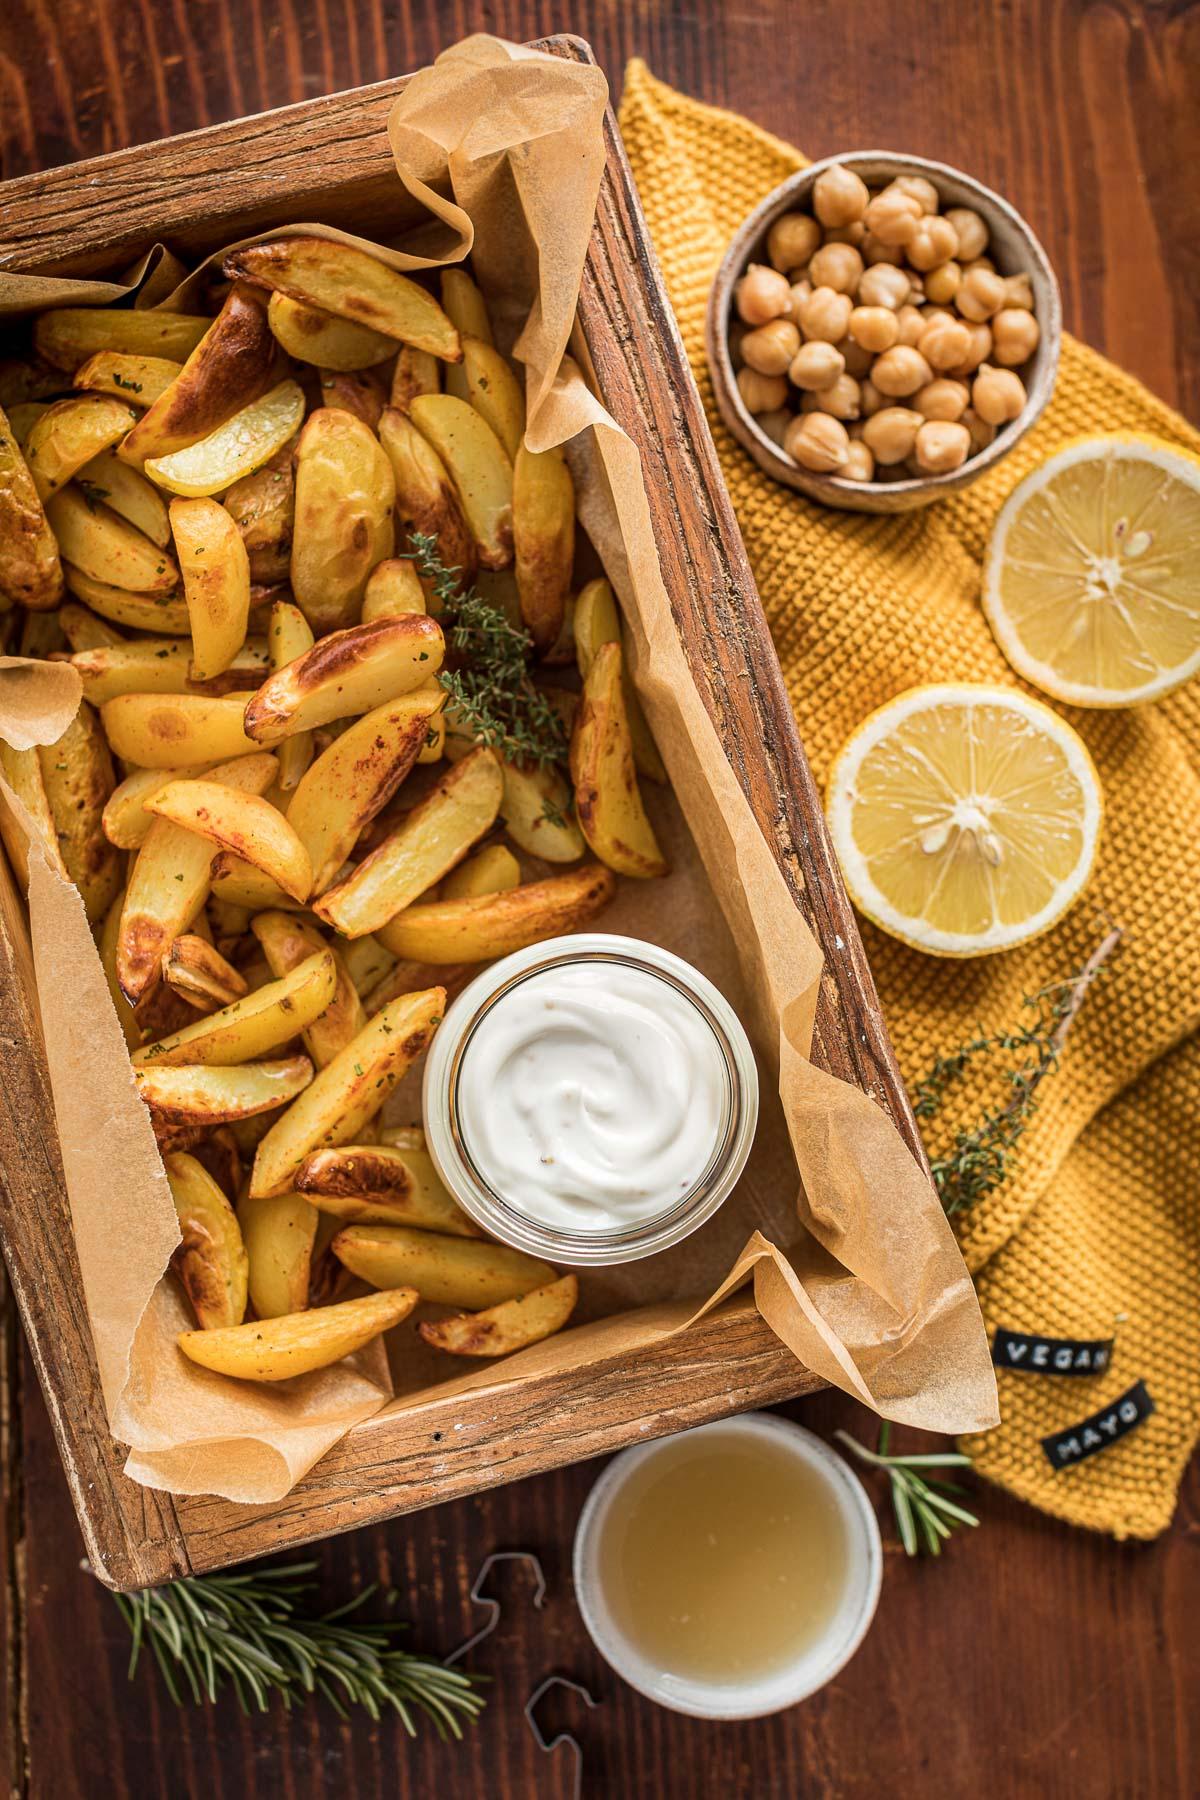 easy vegan mayo with aquafaba with baked poatatoes soy-free mayo ready in 2 minutes ricetta maionese vegana senza uova senza soia con patate al forno